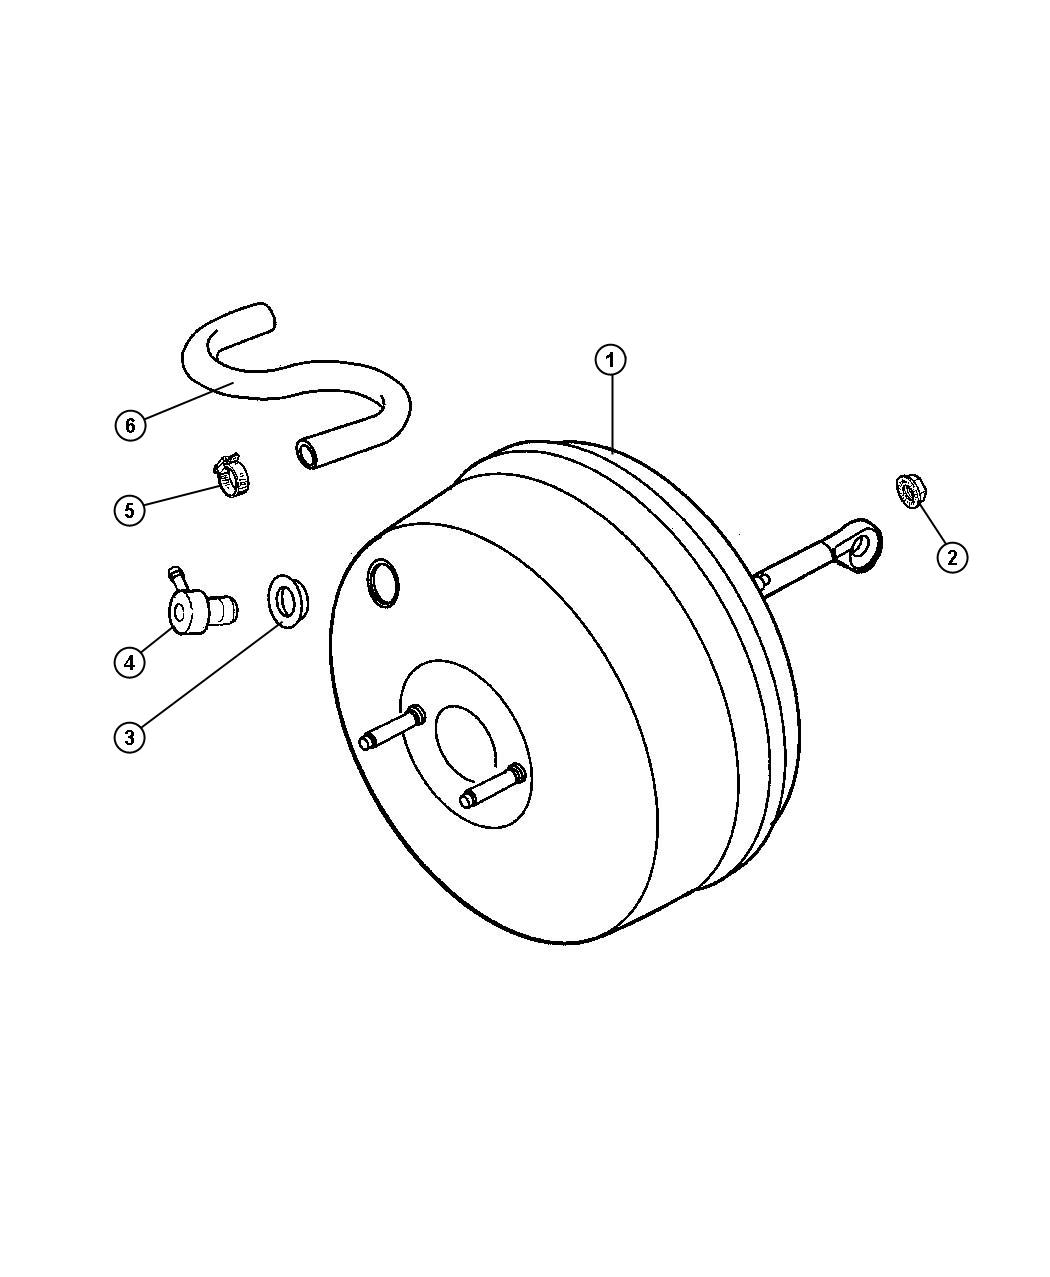 Jeep Wrangler Booster Power Brake Maintenance